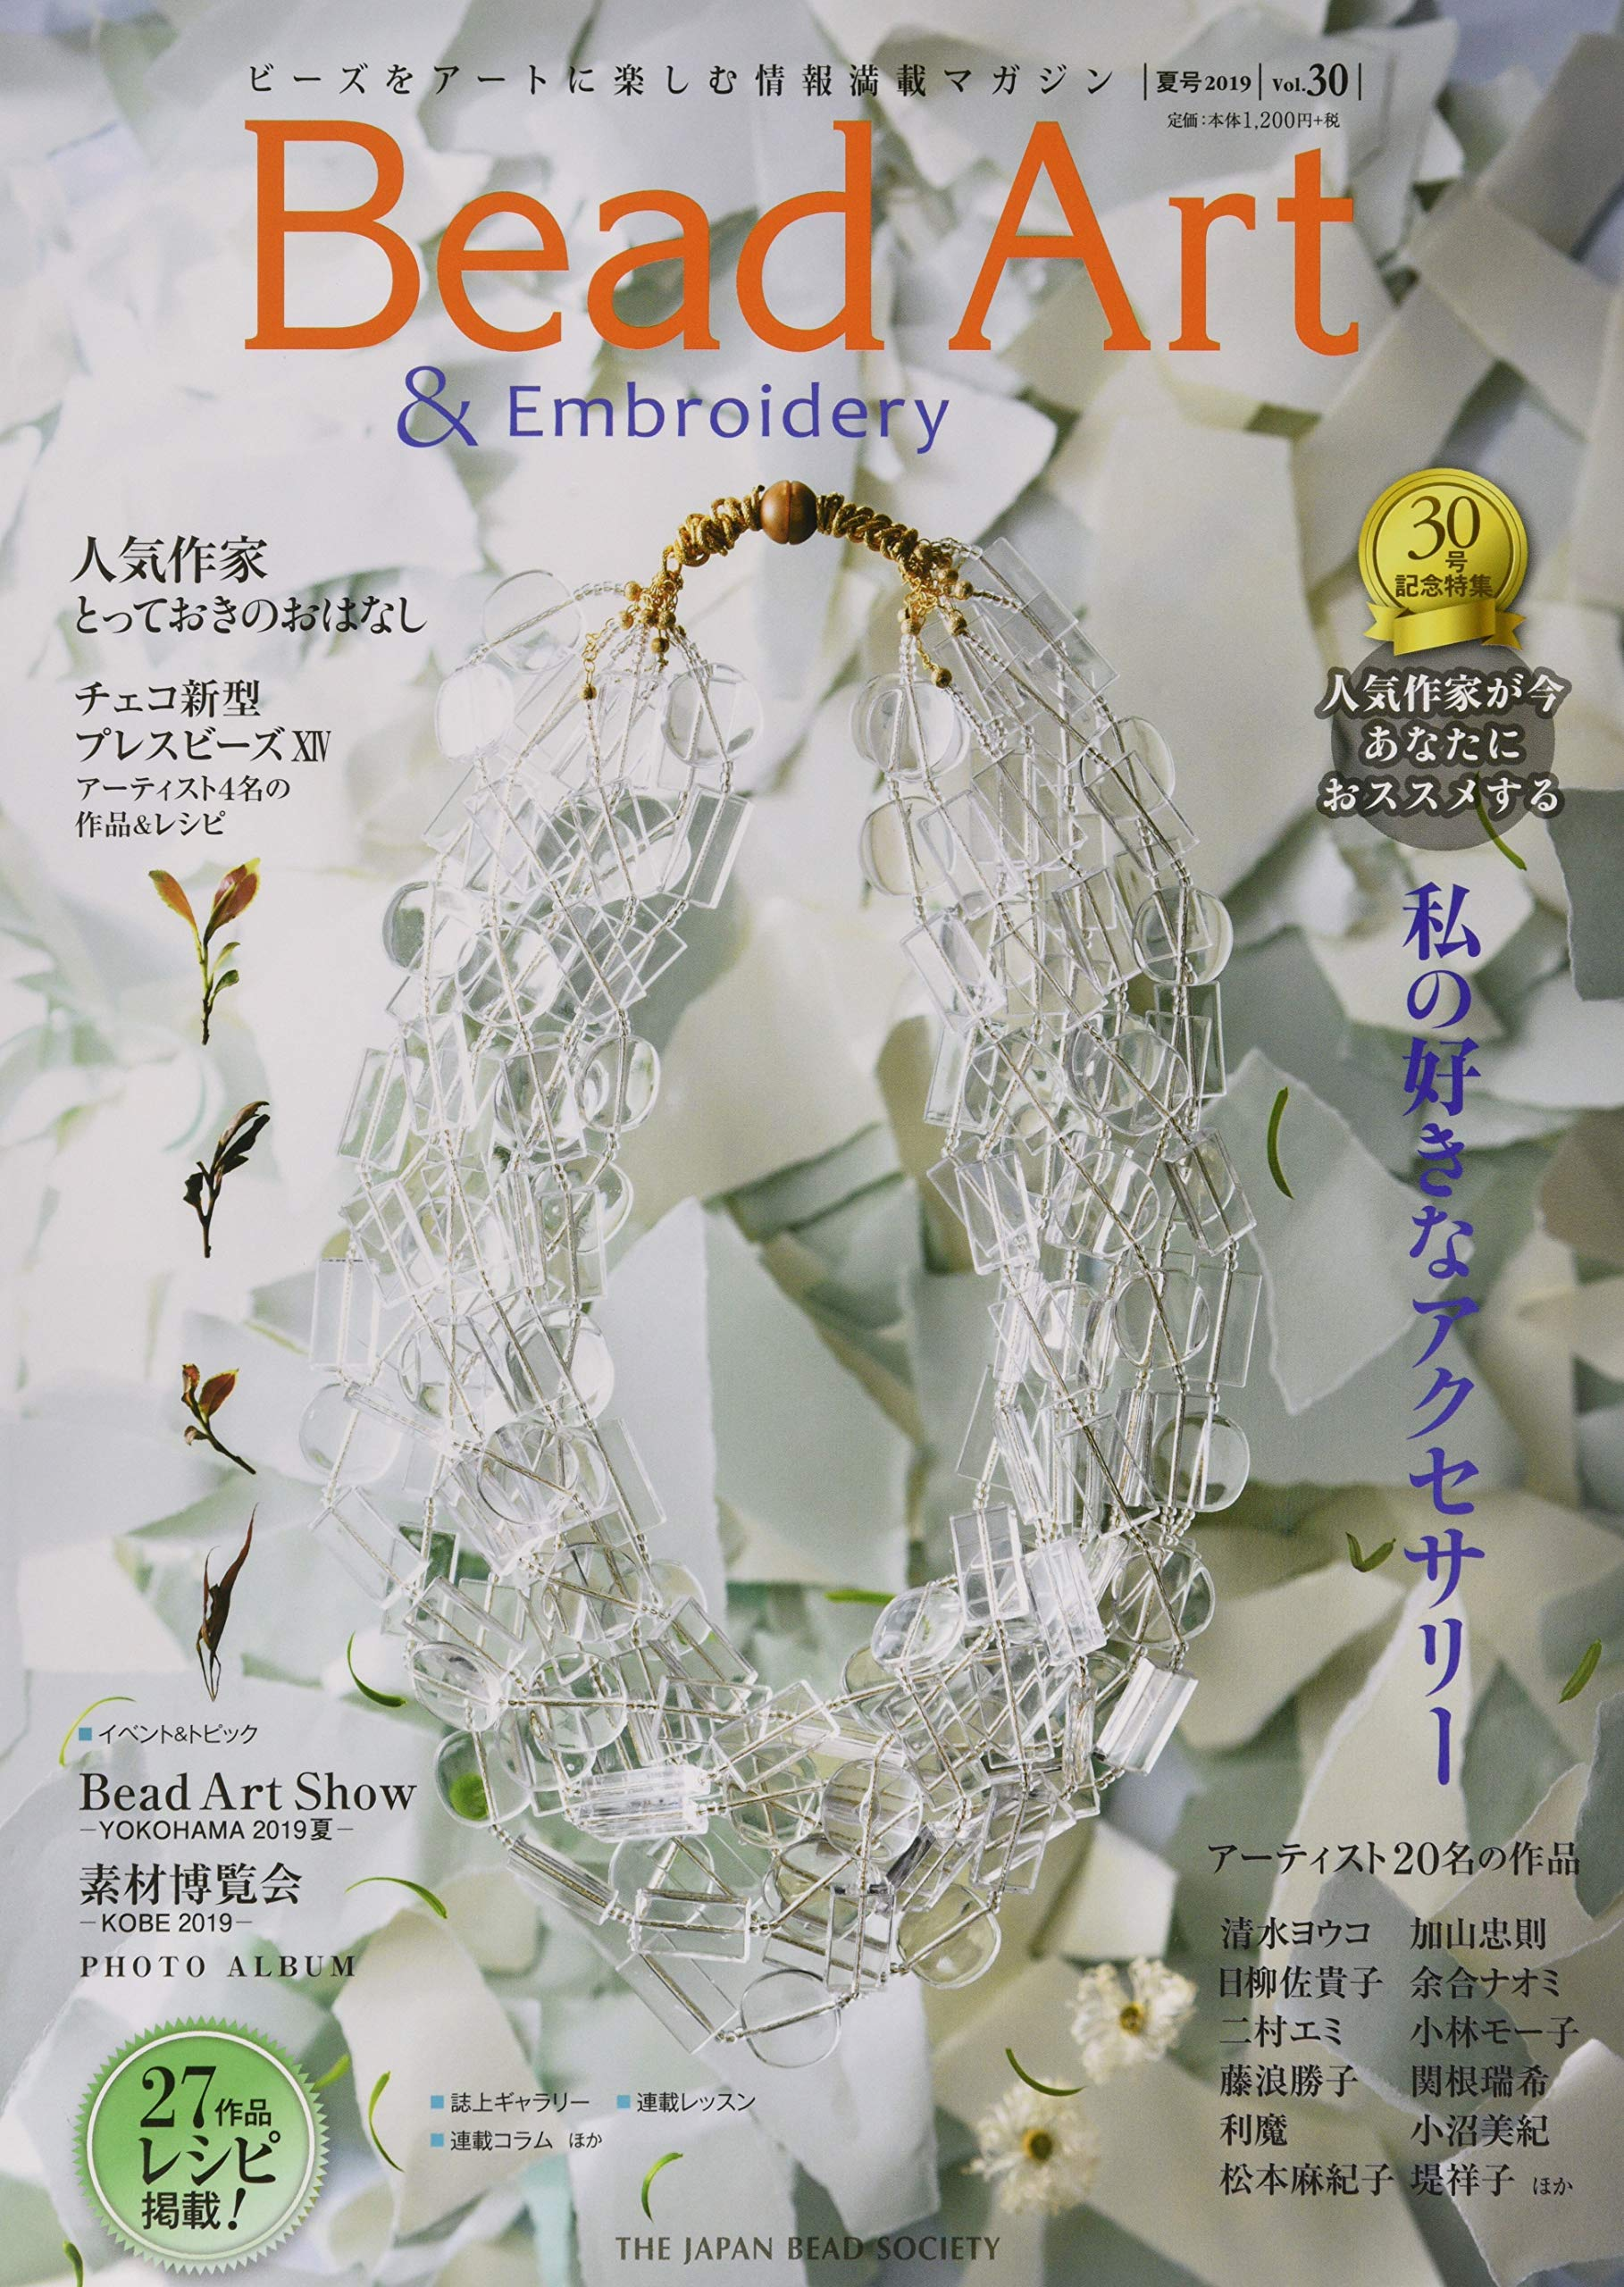 Bead Art Summer 2019 vol.30 Magazine